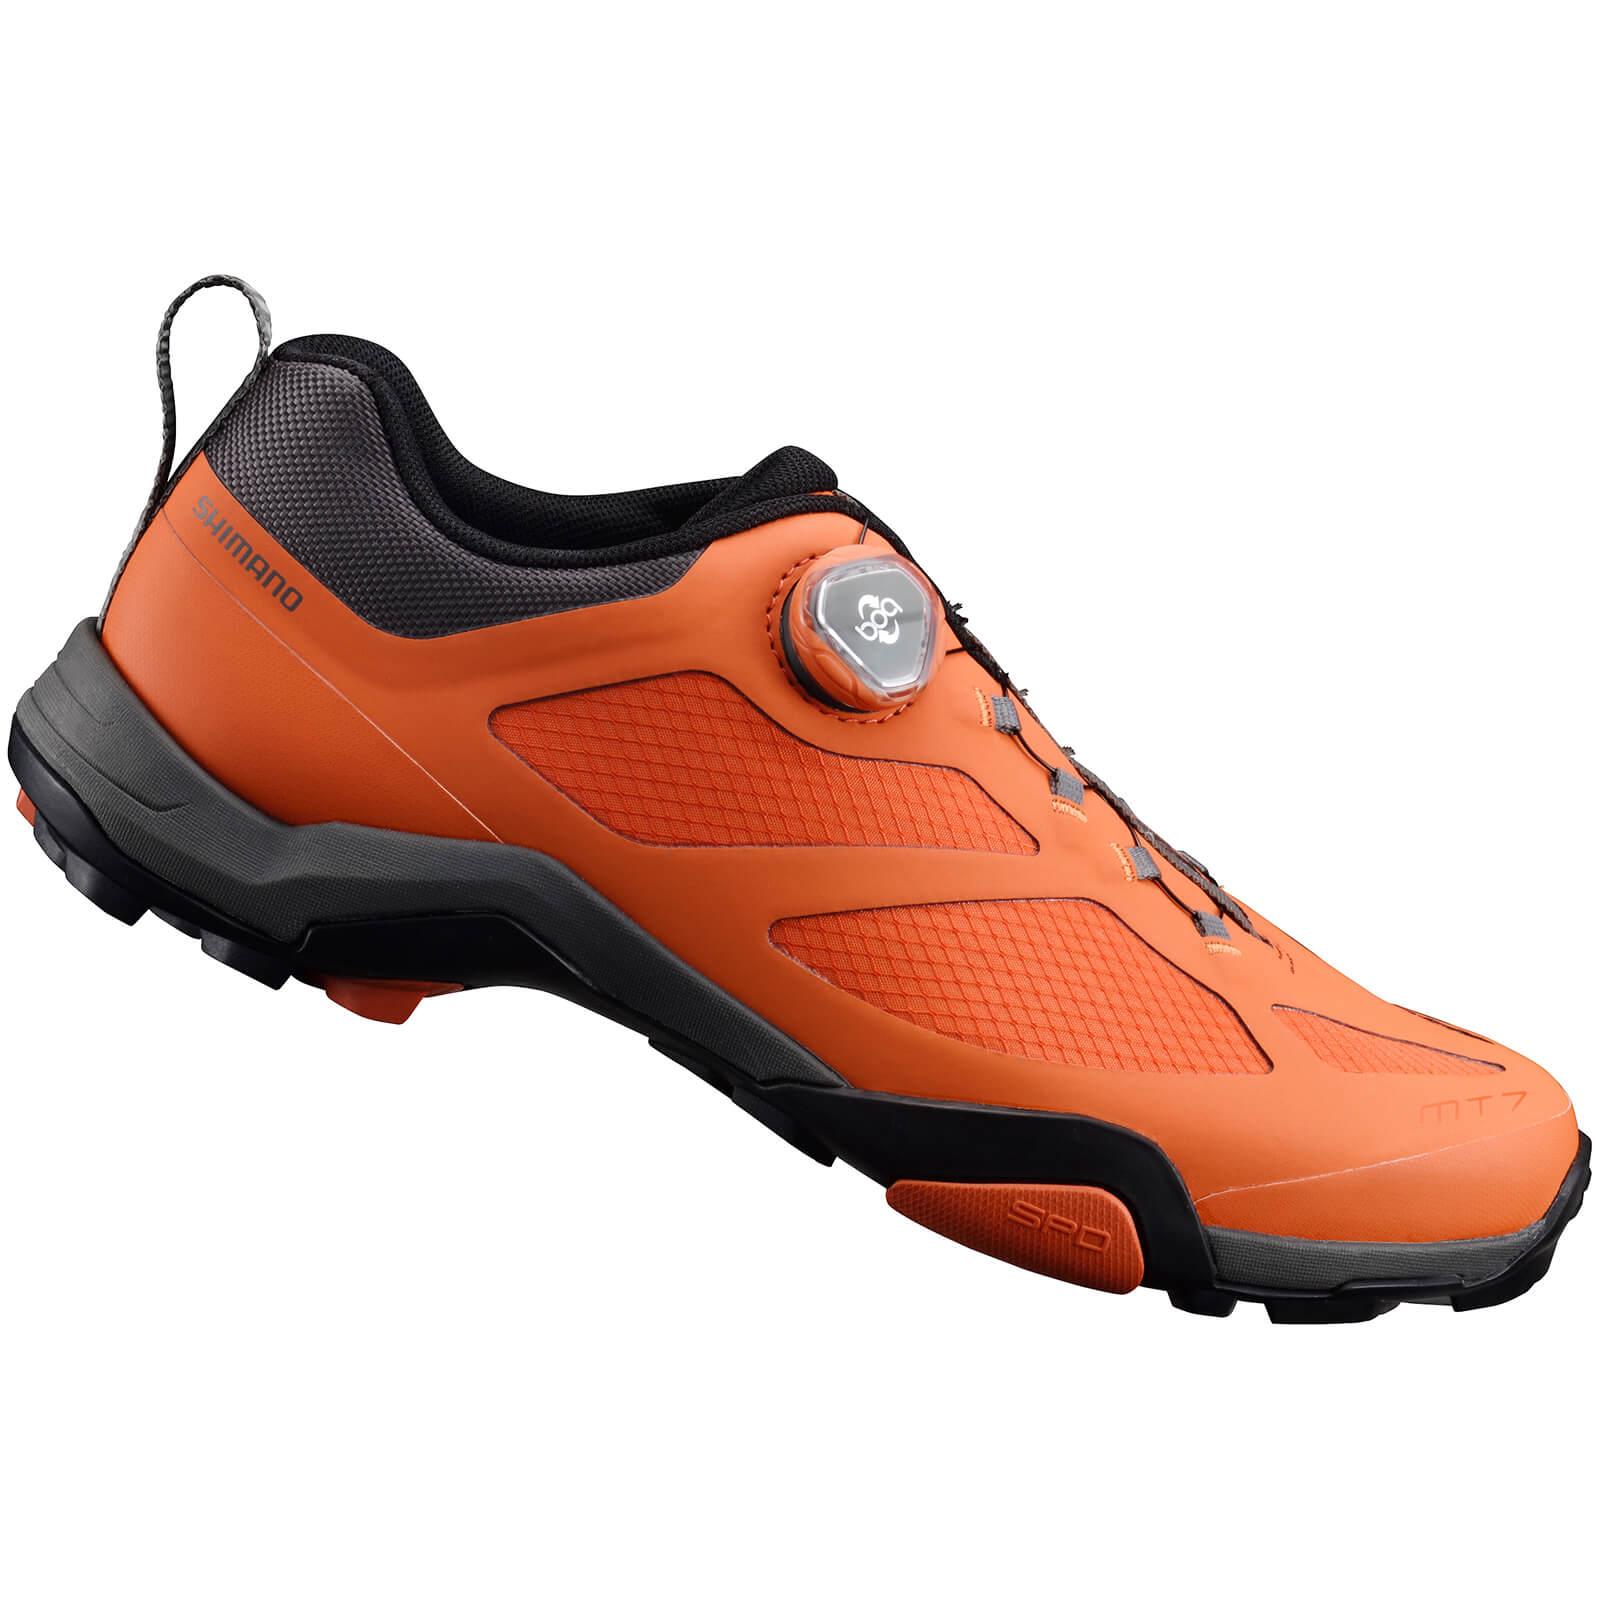 Shimano MT7 MTB Shoes - Orange - UK 12/EU 48 - Orange